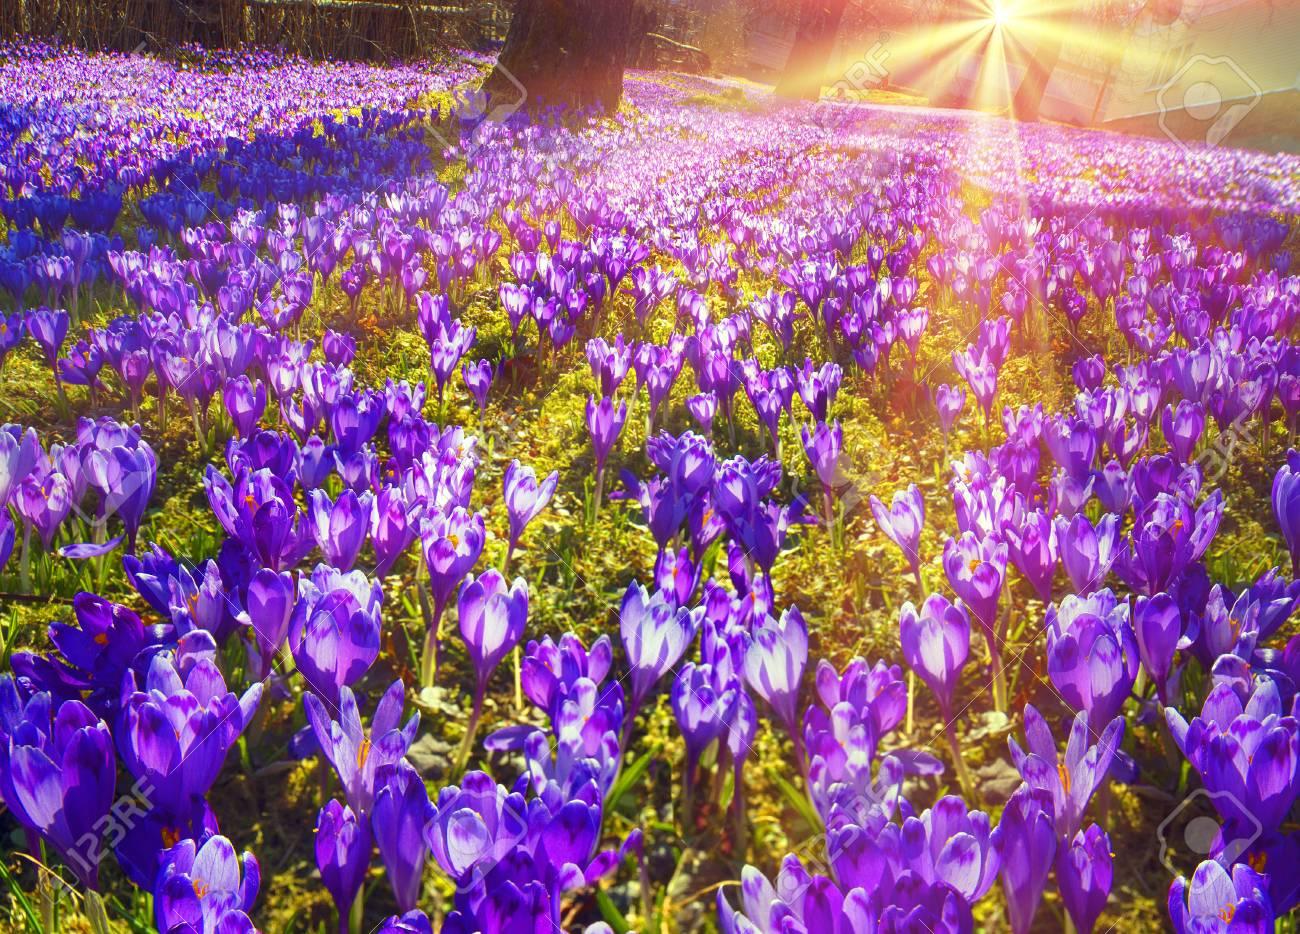 Saffron Crocus Geyfelya First Beautiful Spring Flowers Growing